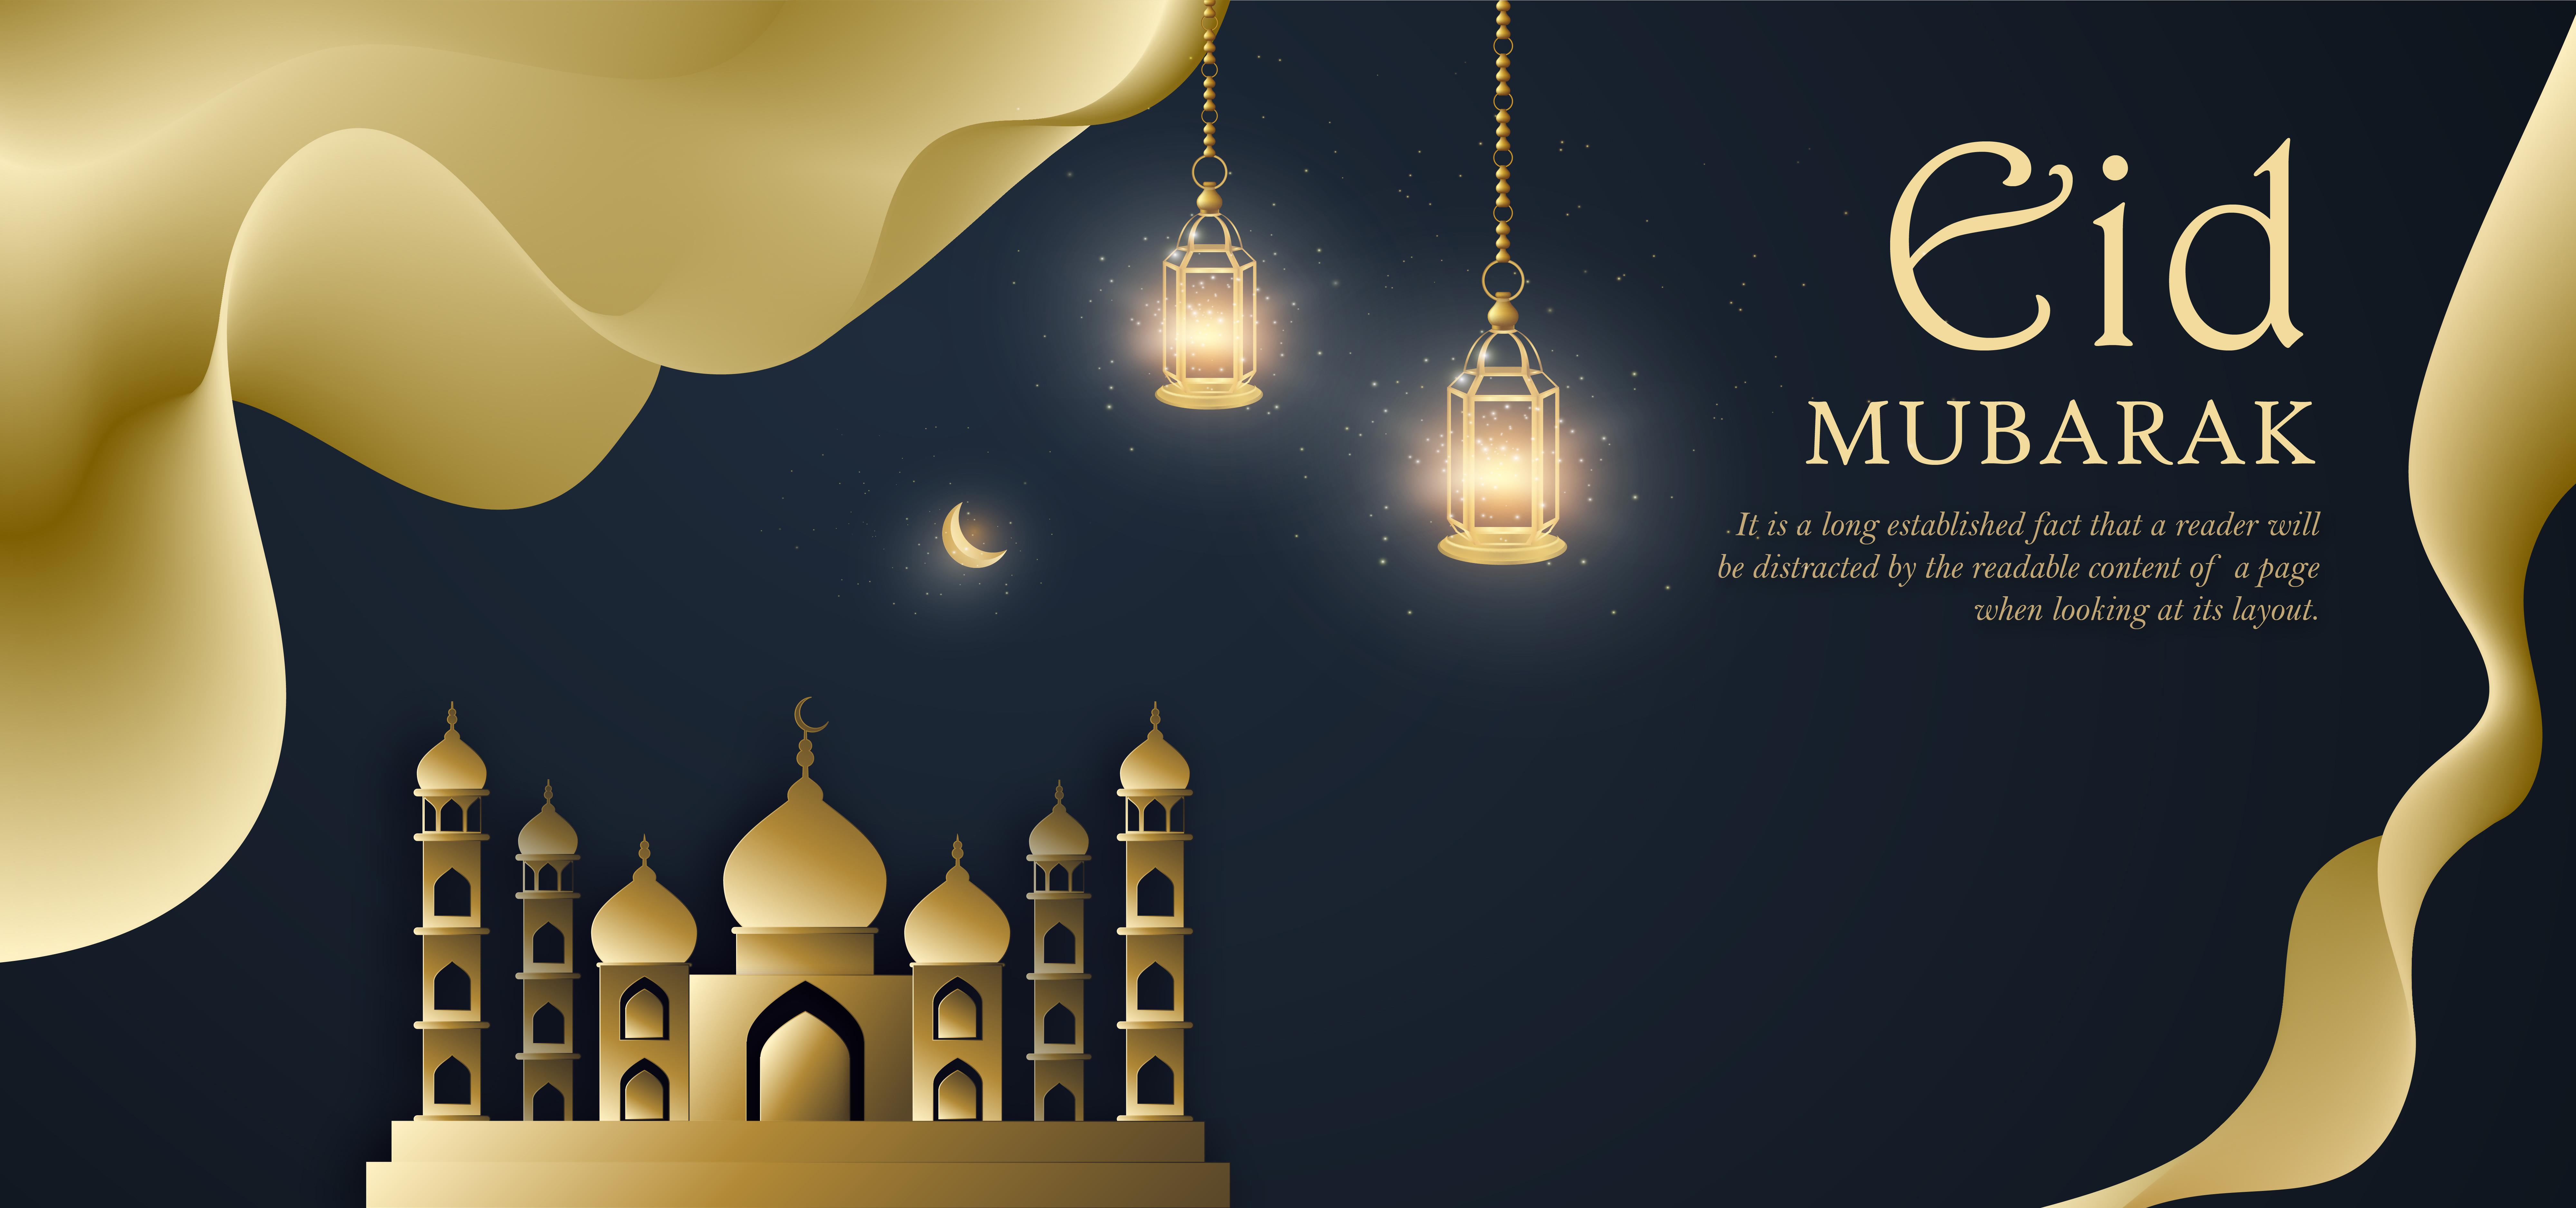 gold and navy eid mubarak royal luxury banner background download free vectors clipart graphics vector art vecteezy